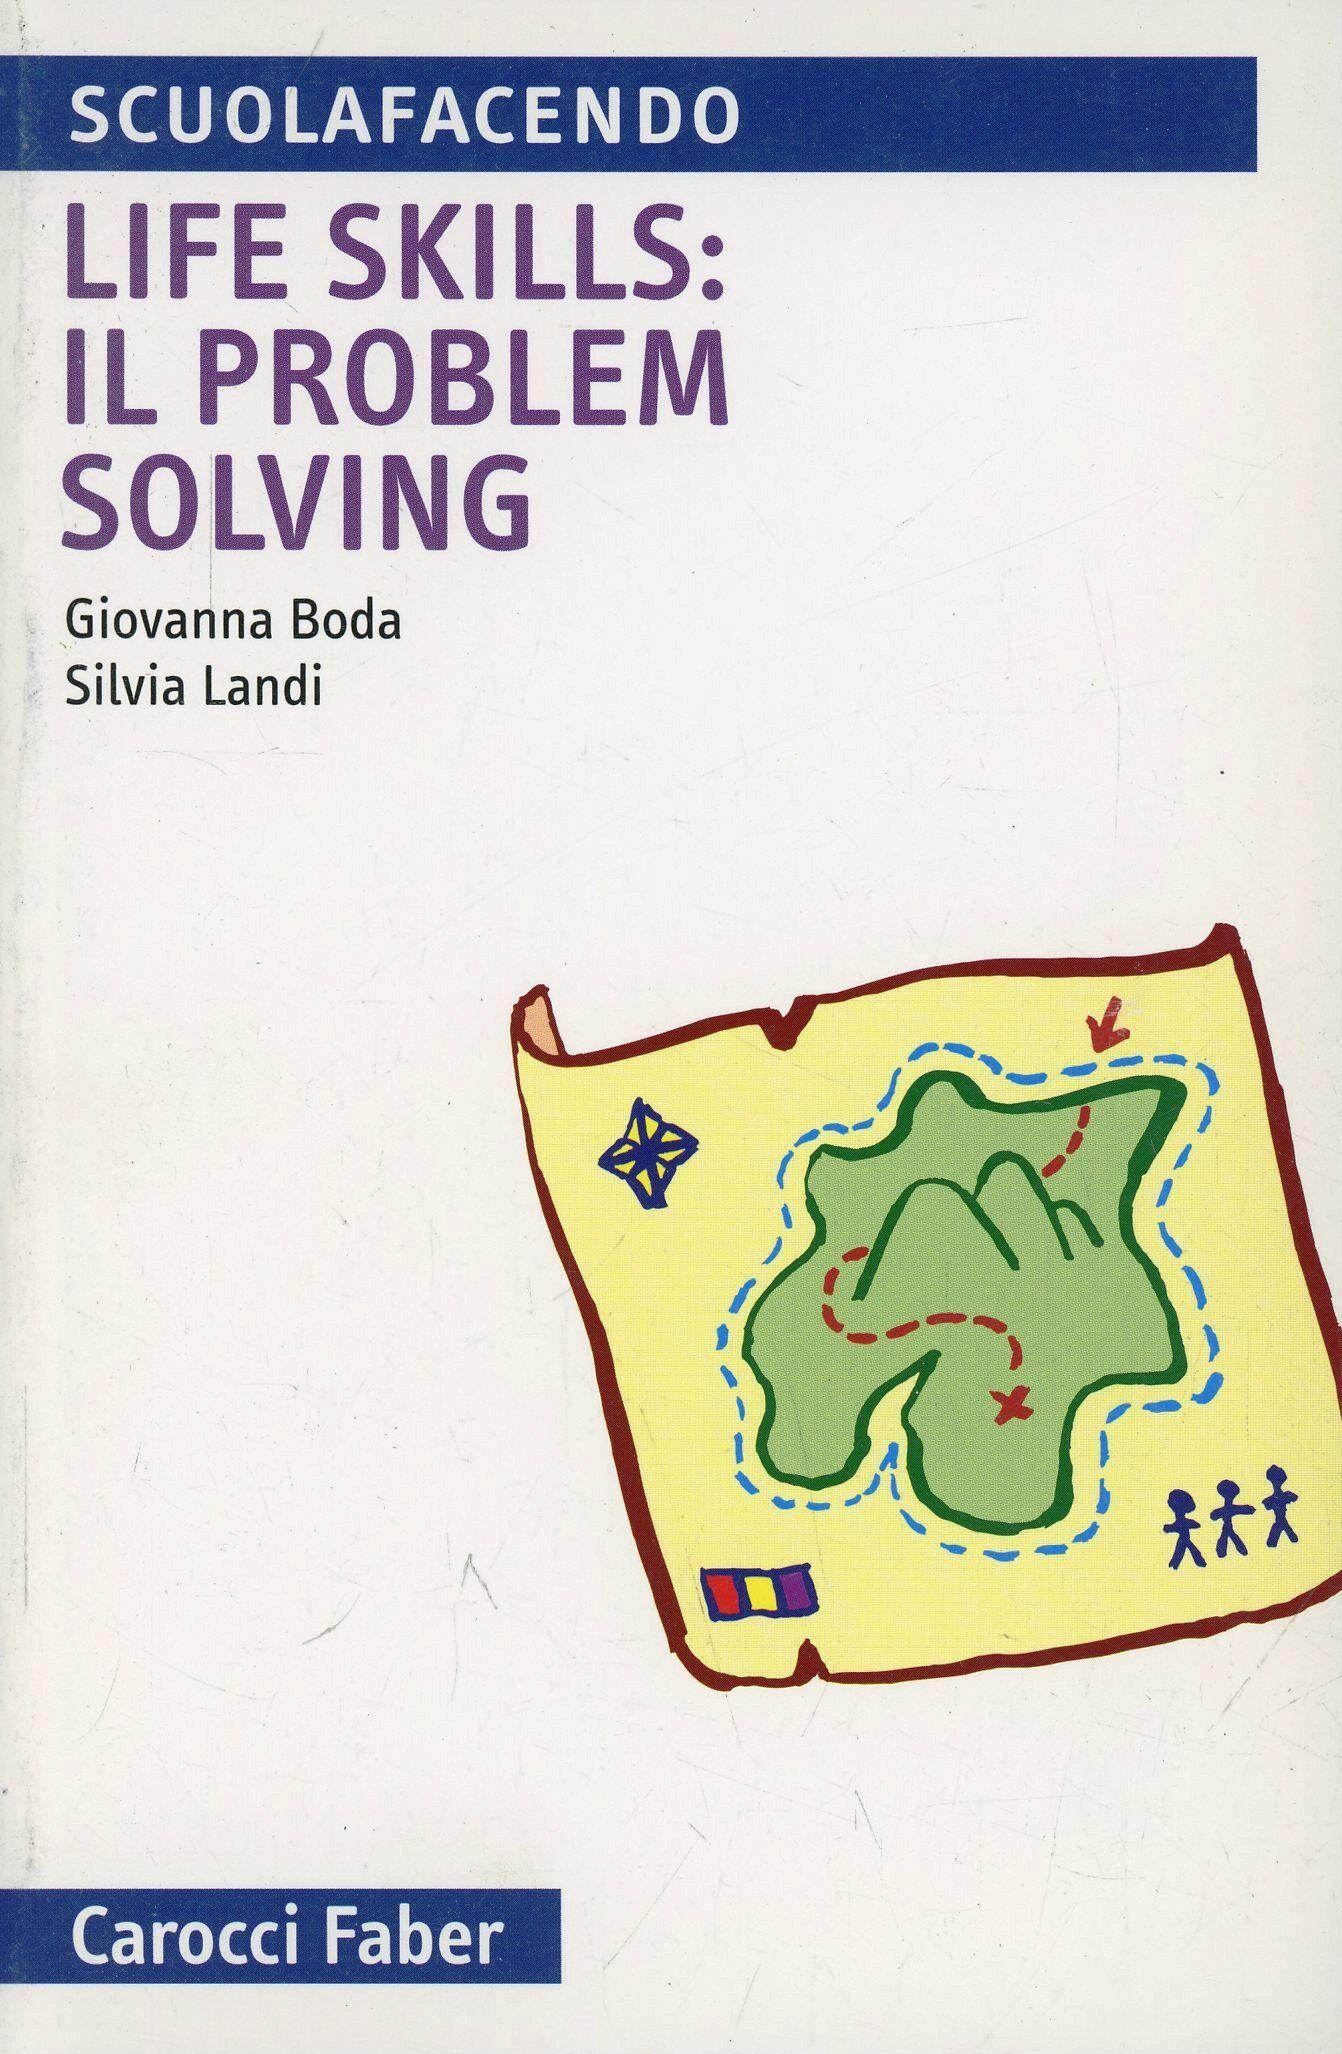 Life skills: il problem solving